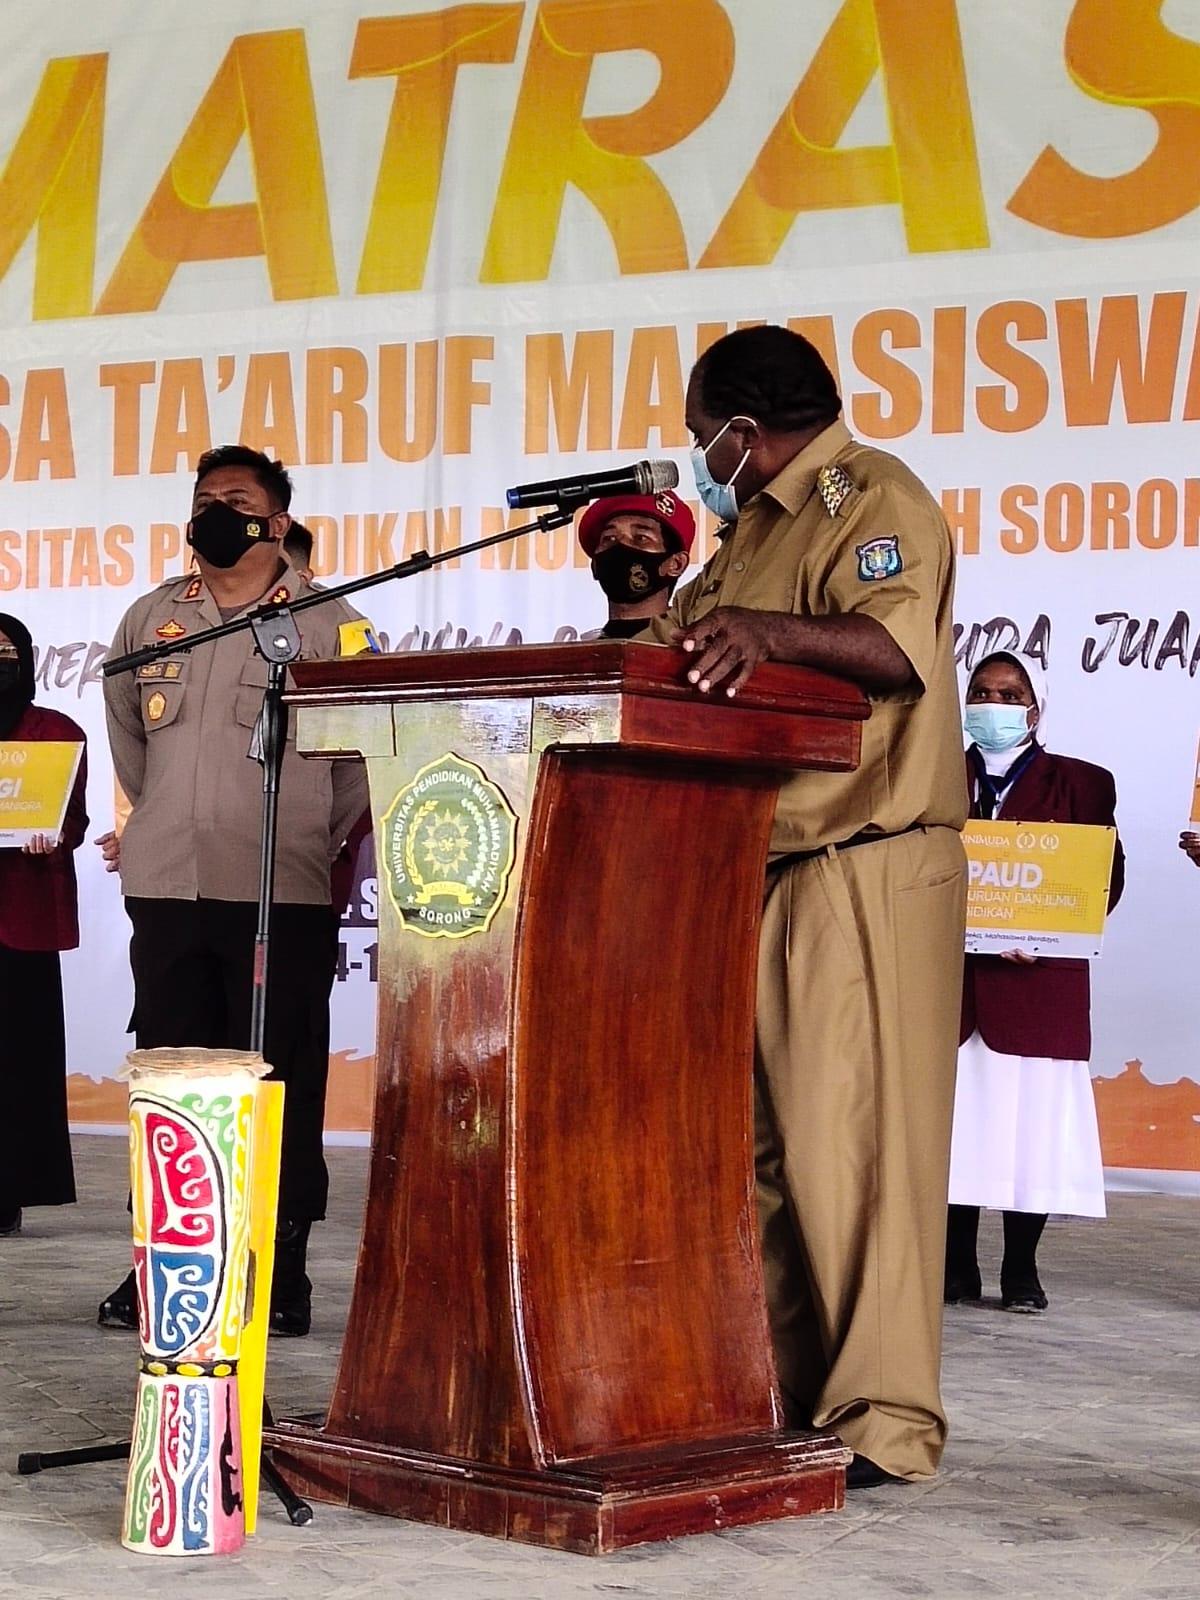 Kapolres Sorong Hadiri Pembukaan Masa Ta'aruf Mahasiswa (MATRAS) Universitas Pendidikan Muhammadiyah Sorong Angkatan 2021.